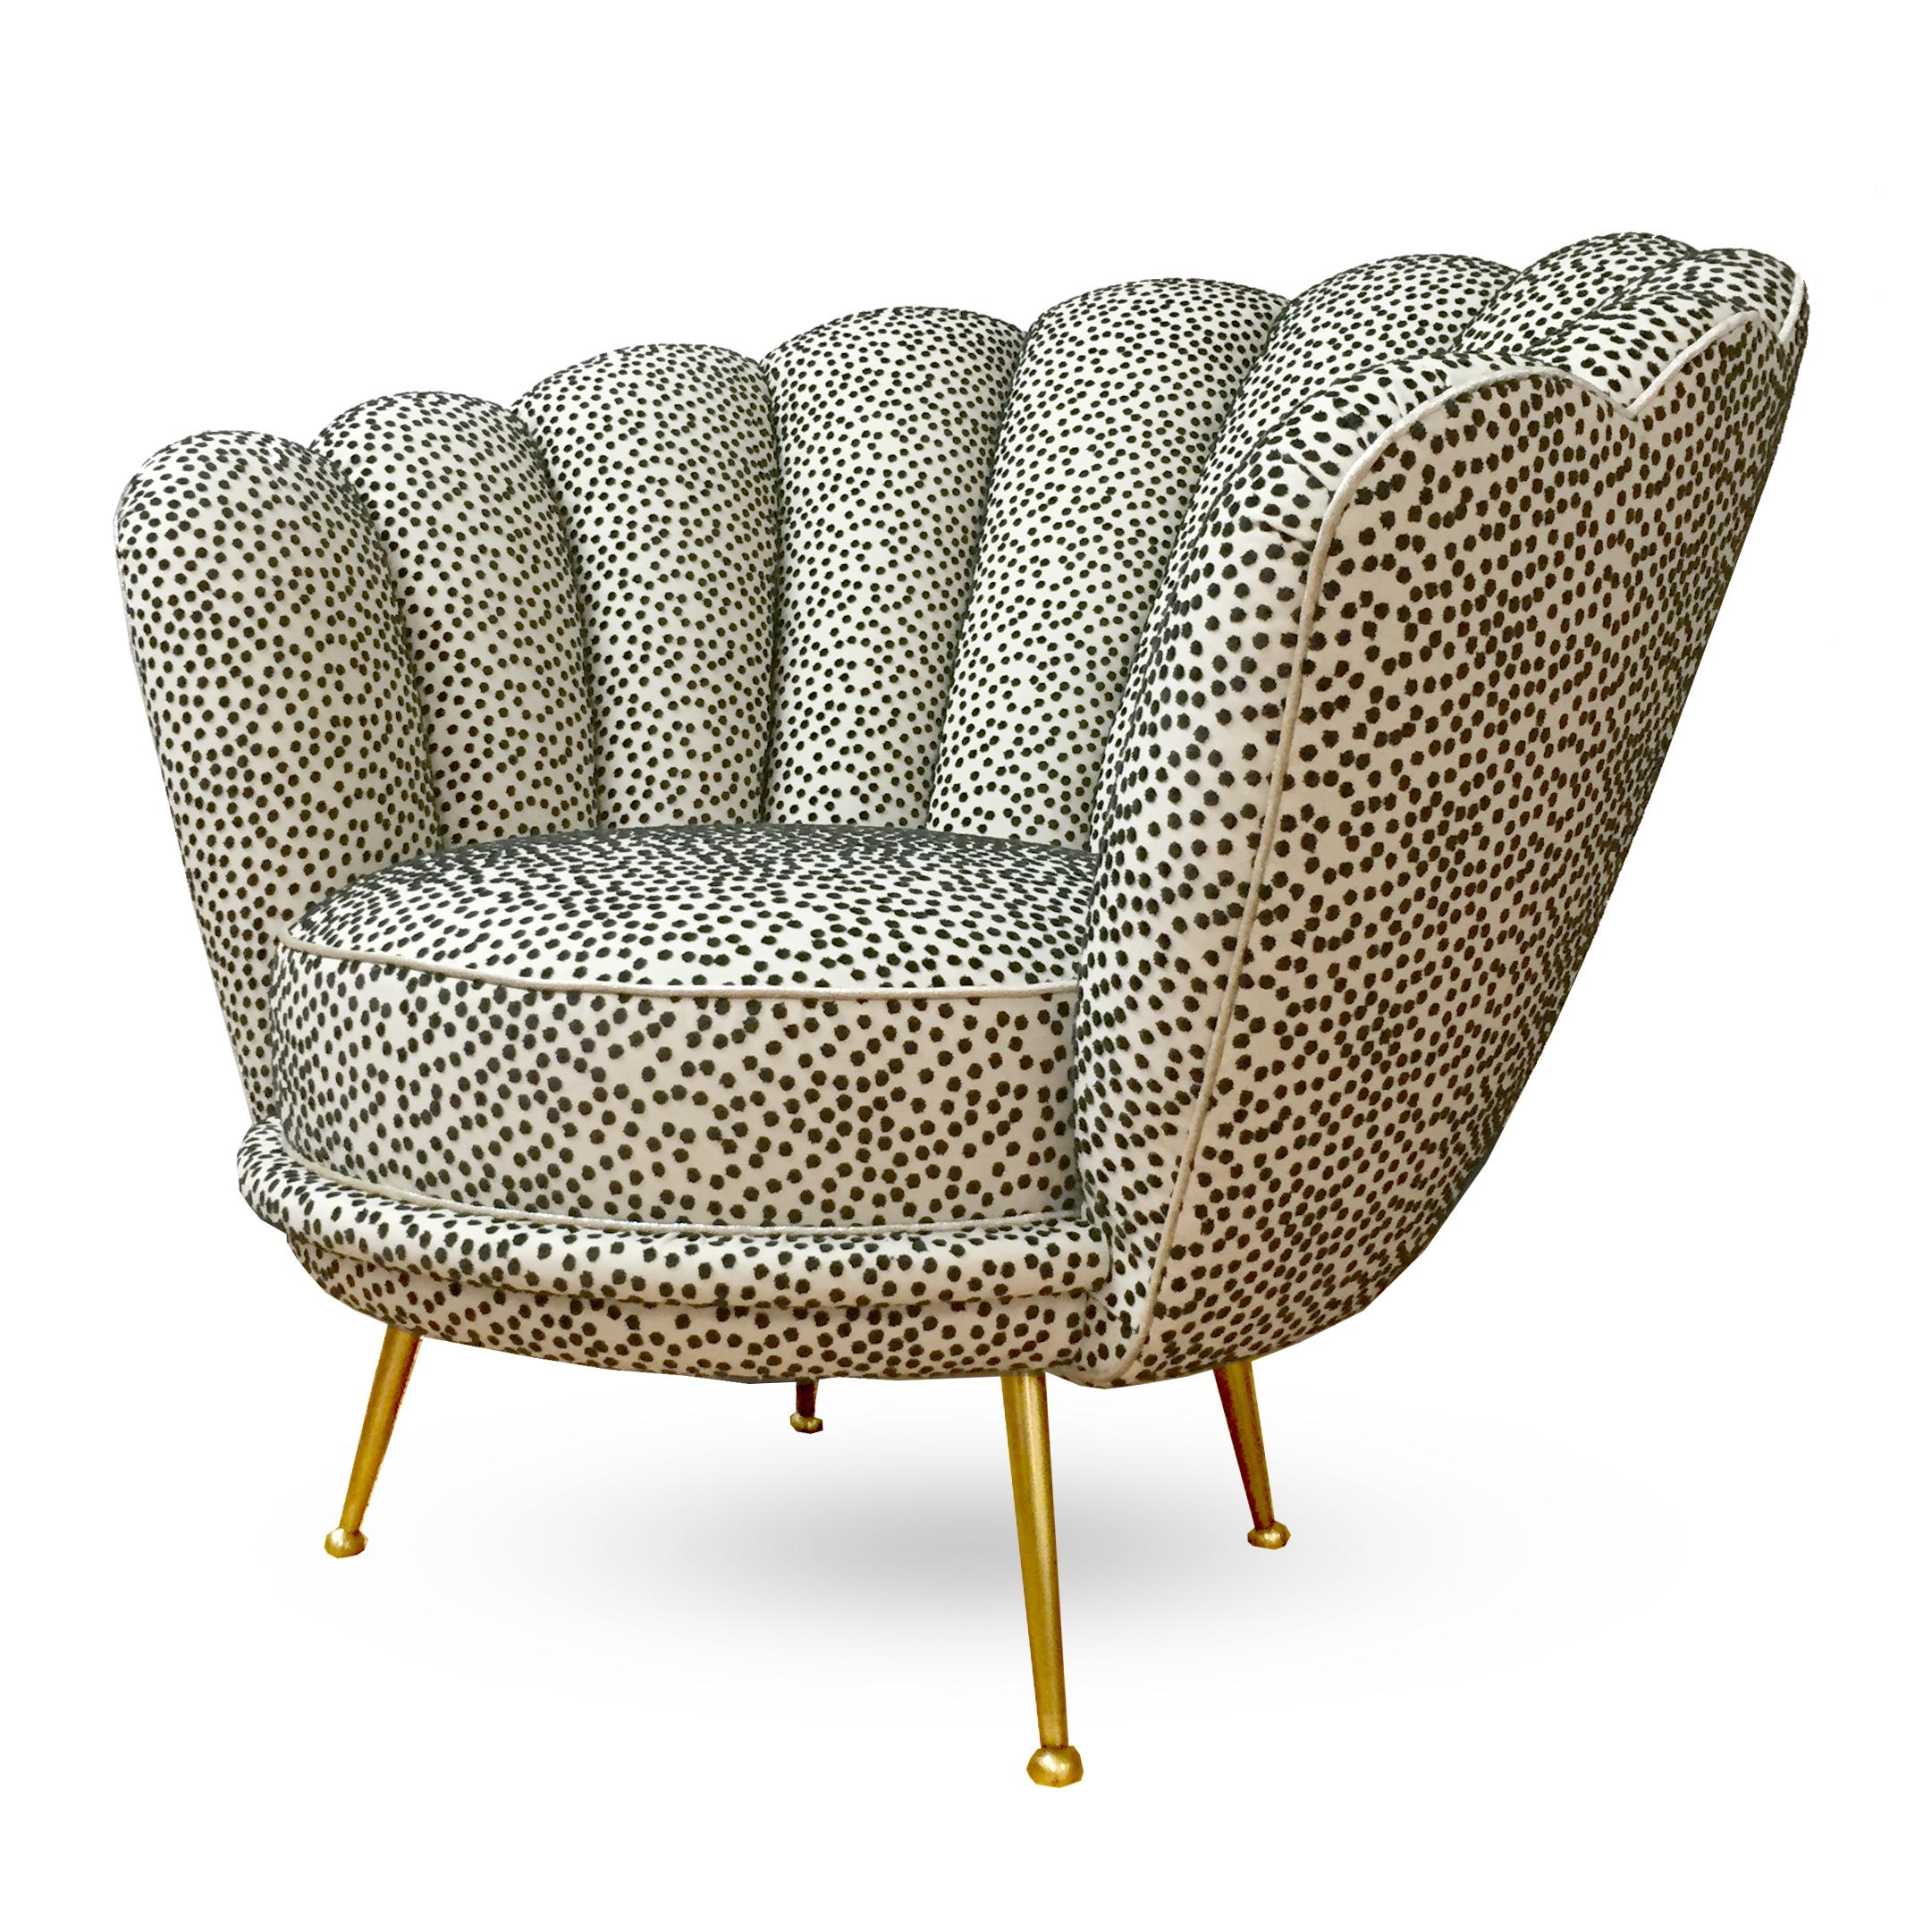 Shell Chair.jpg